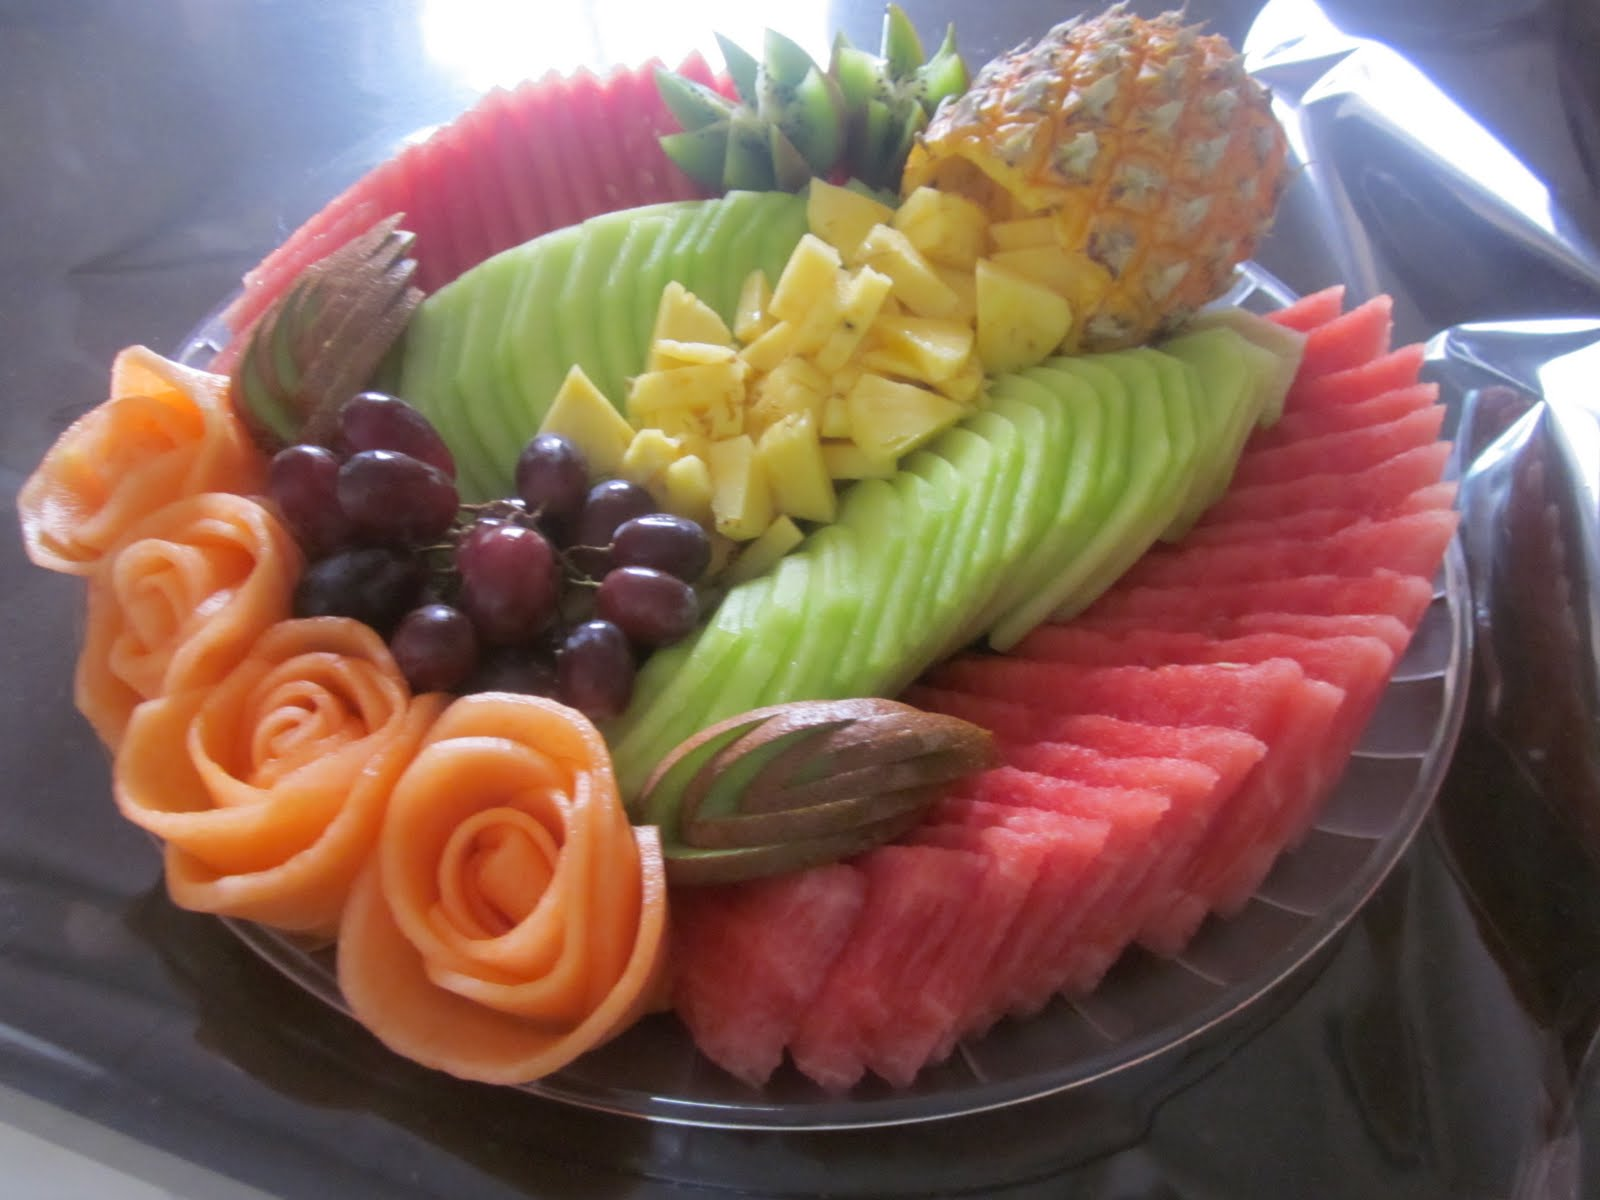 wegmans fruit tray